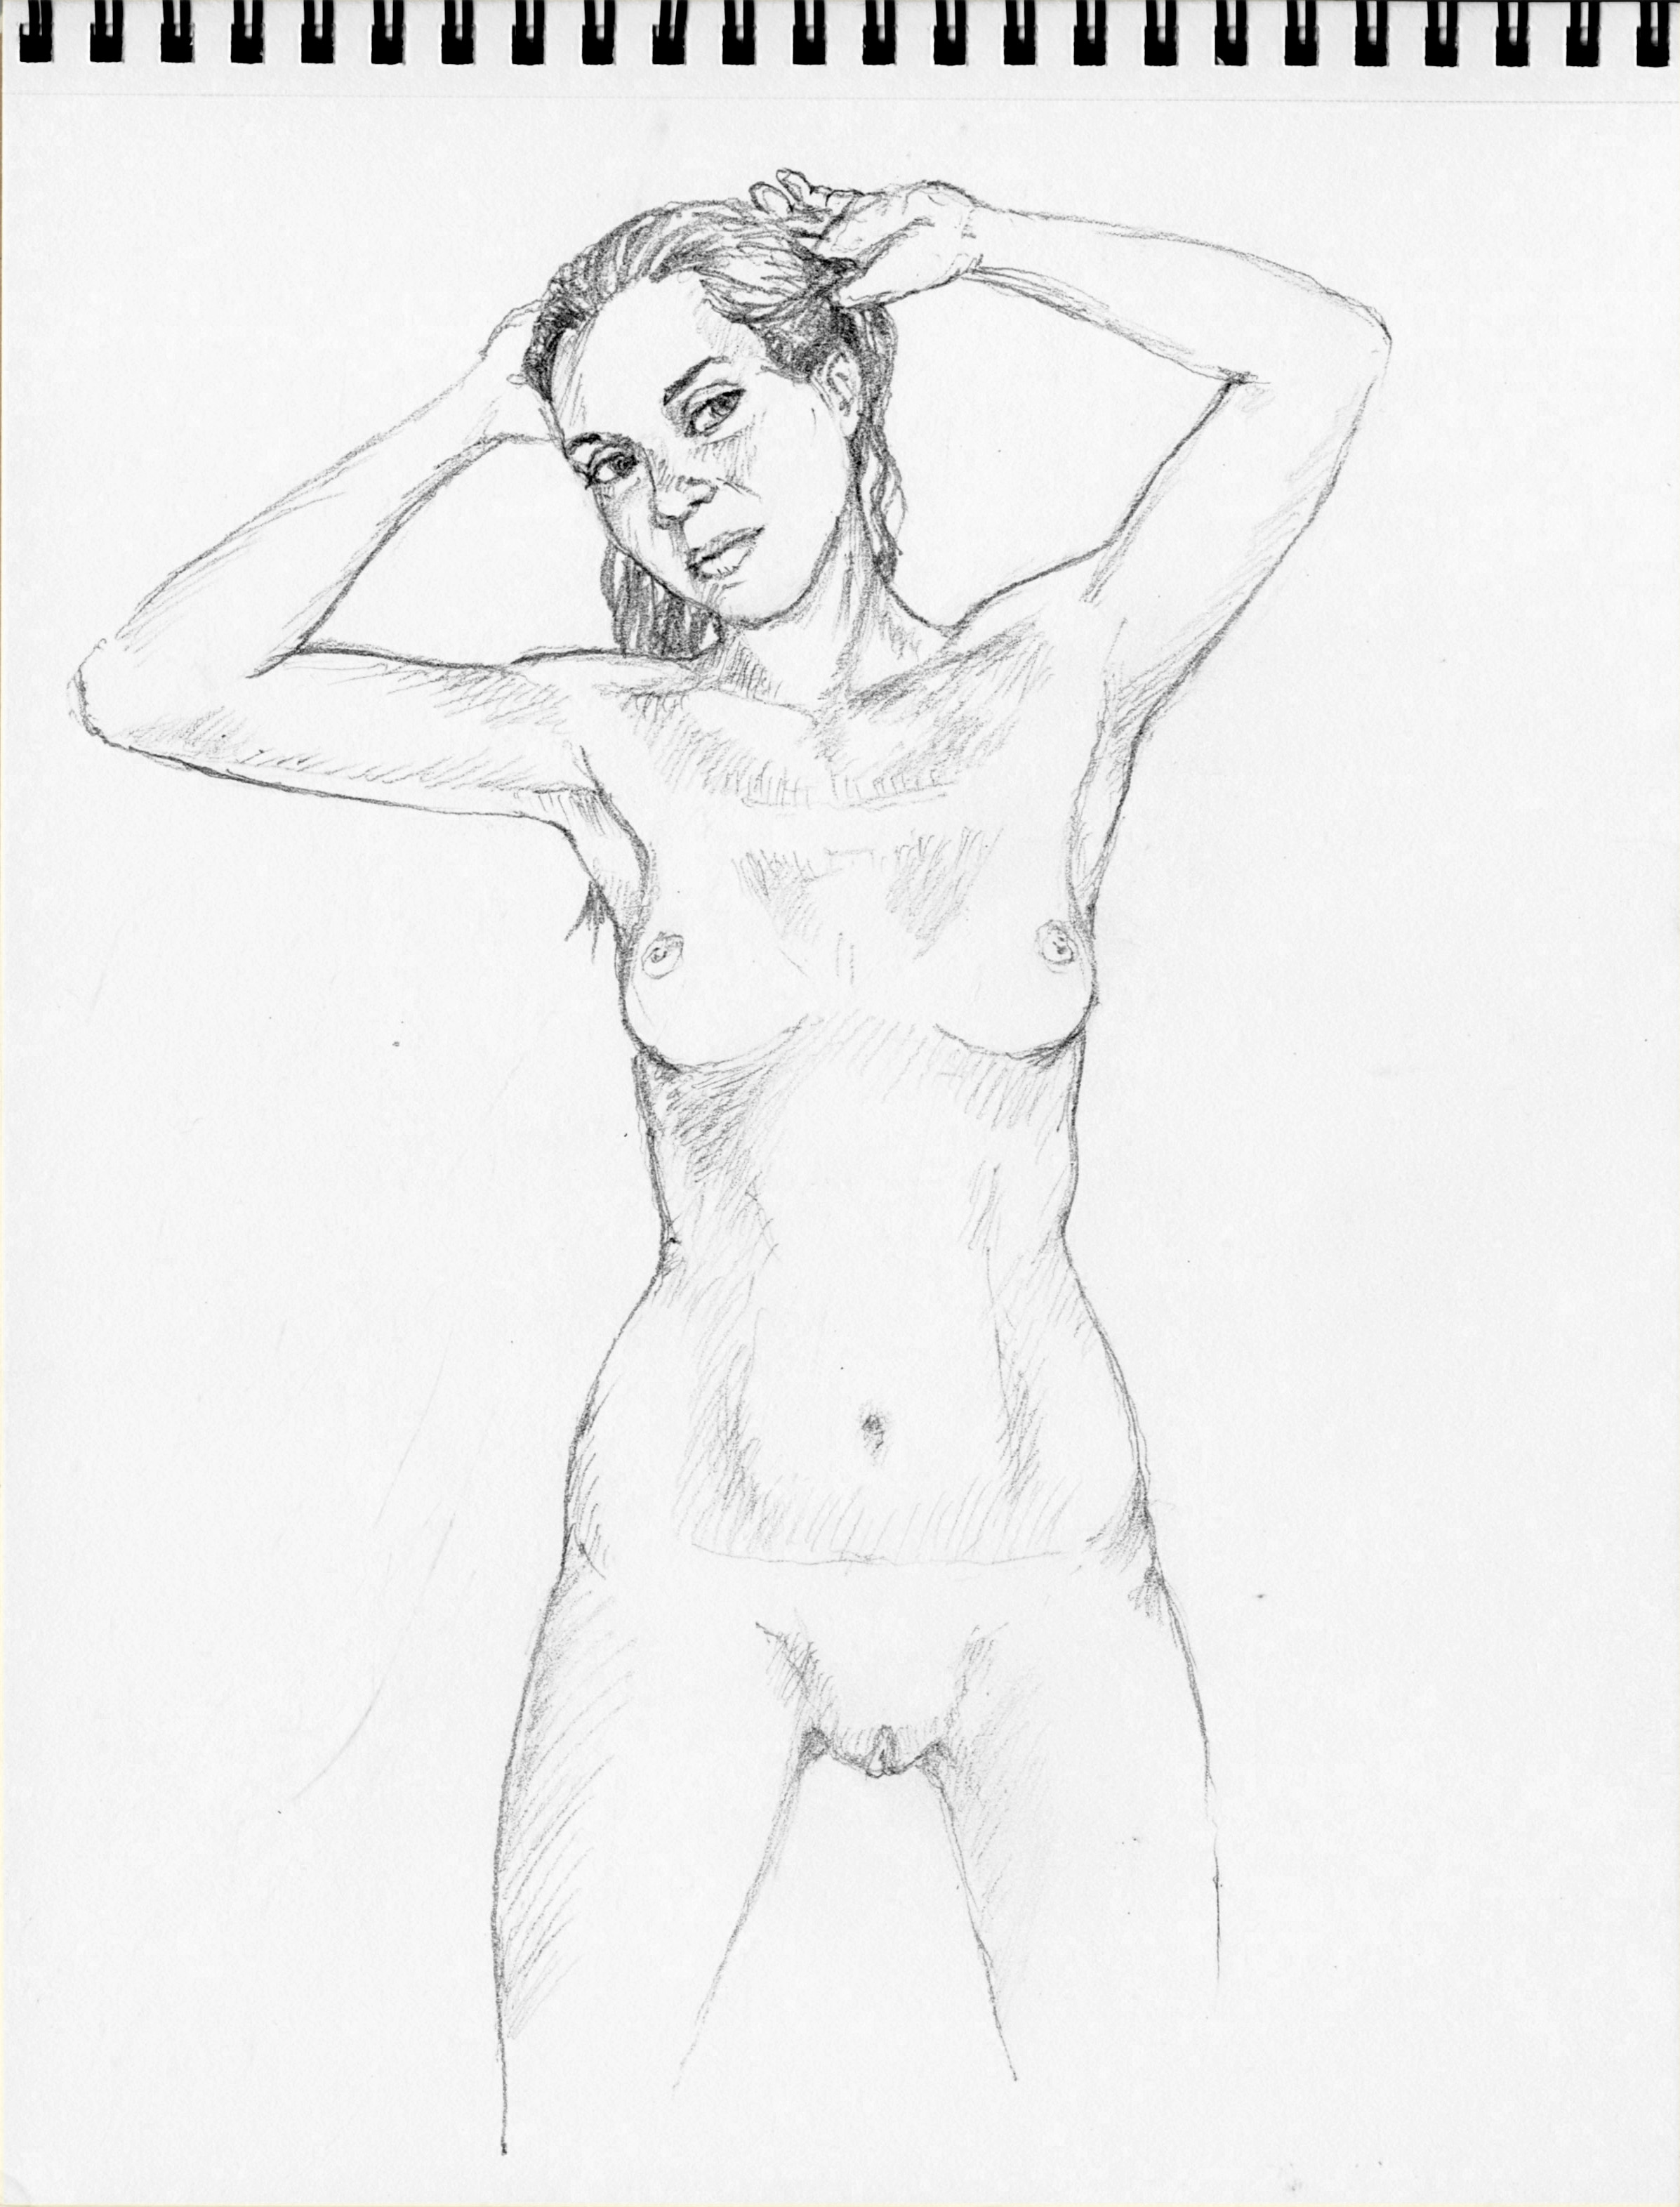 July 2014 sketch443.jpg